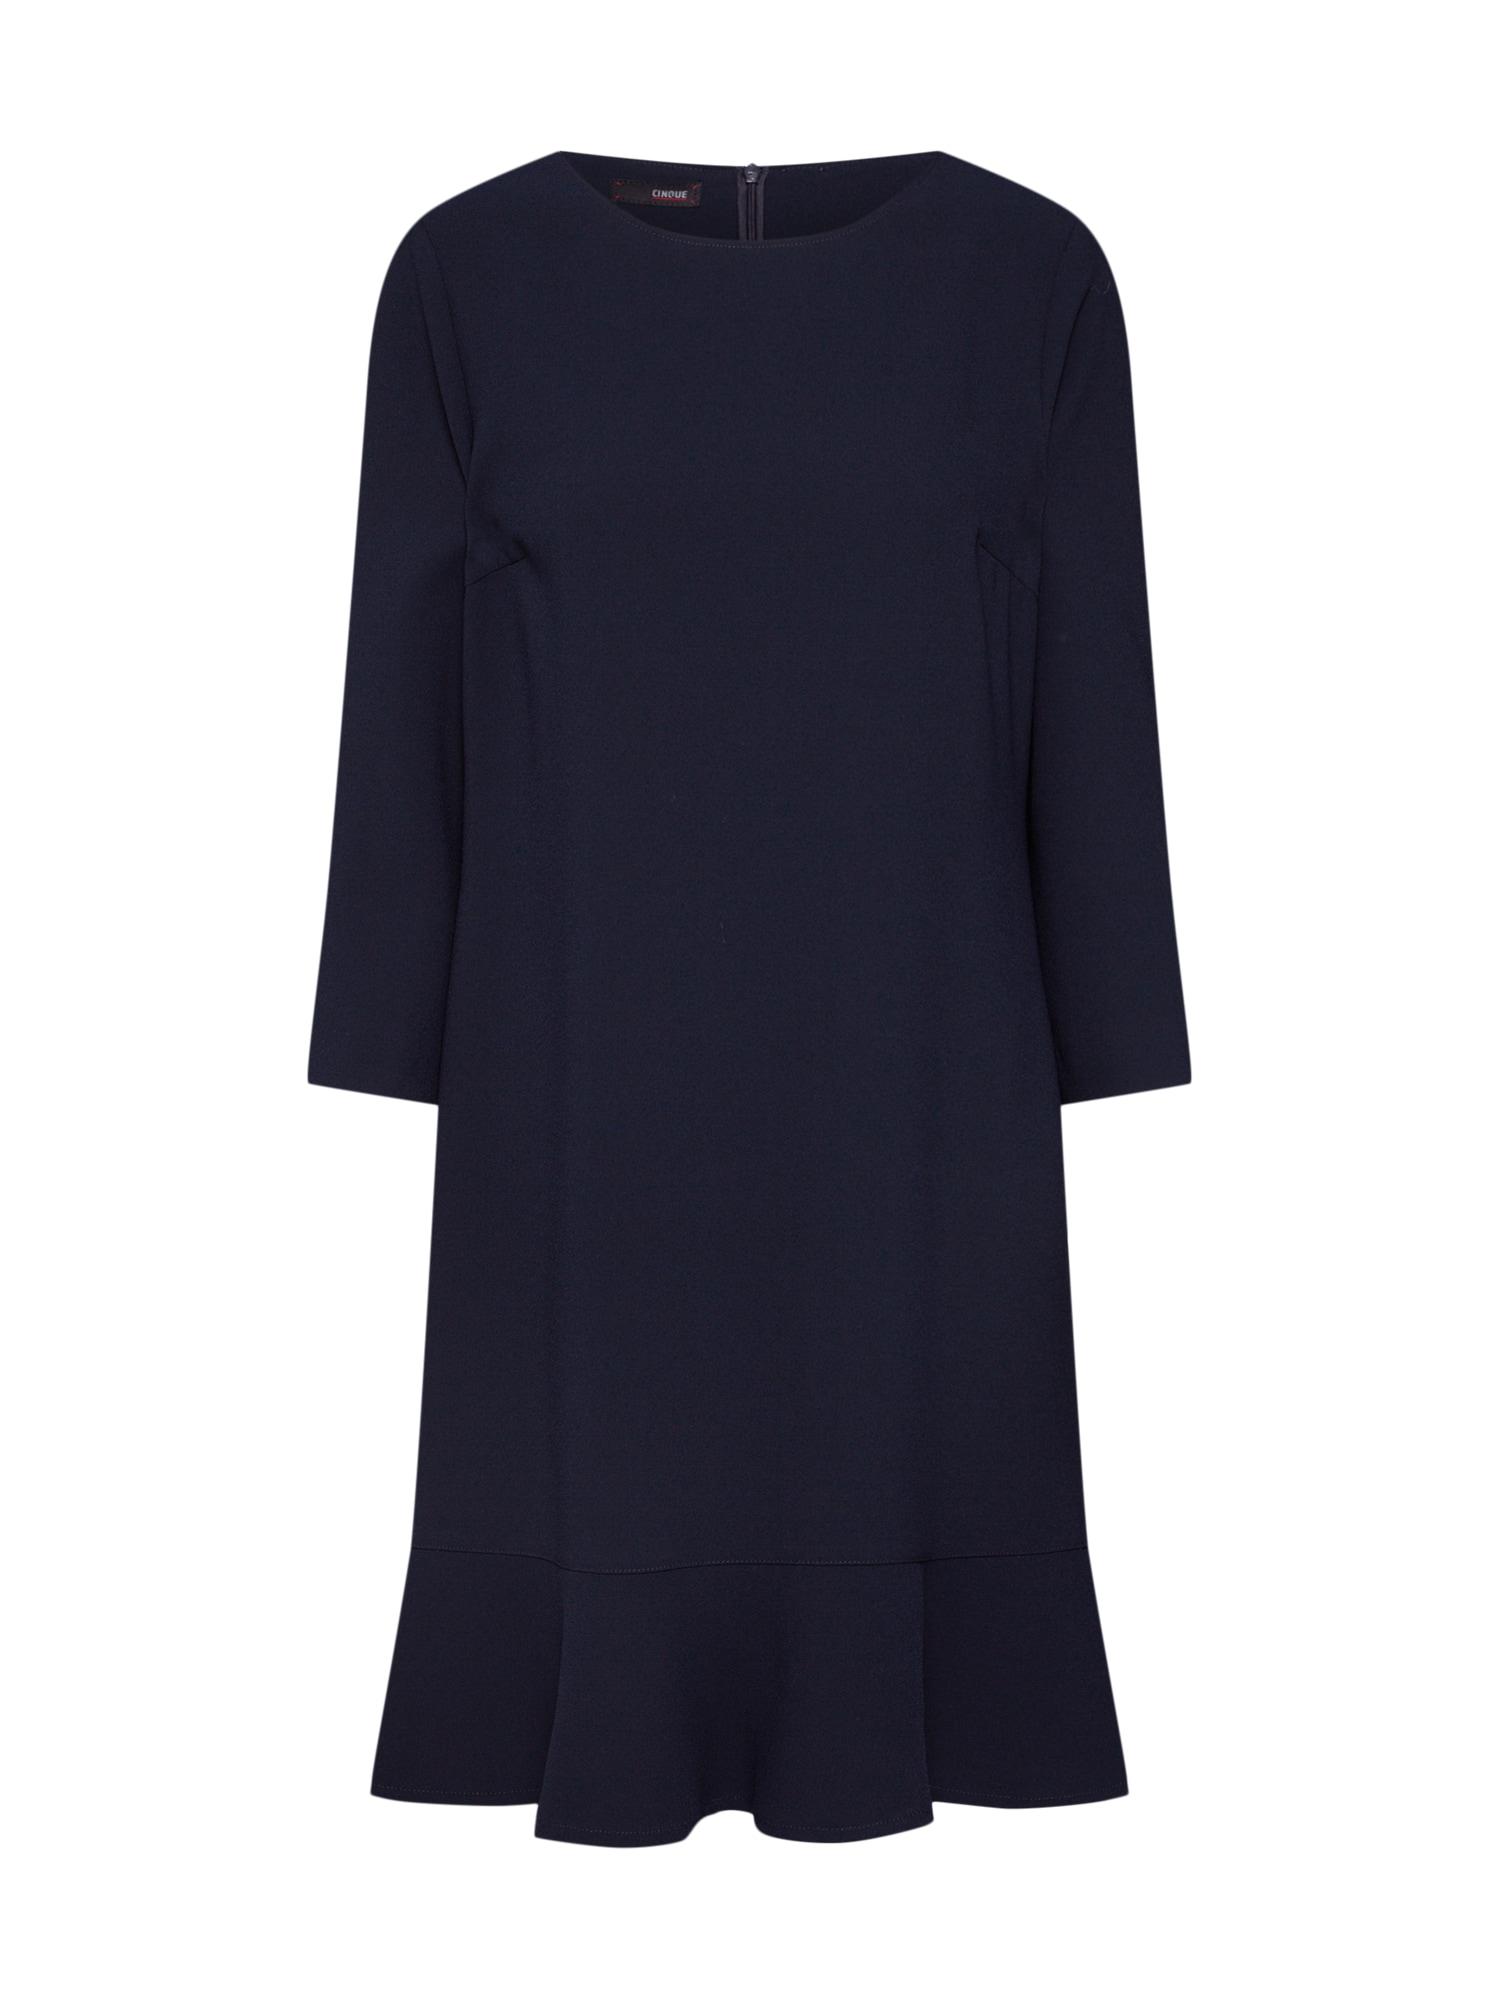 CINQUE Suknelė 'CIDATA' tamsiai mėlyna